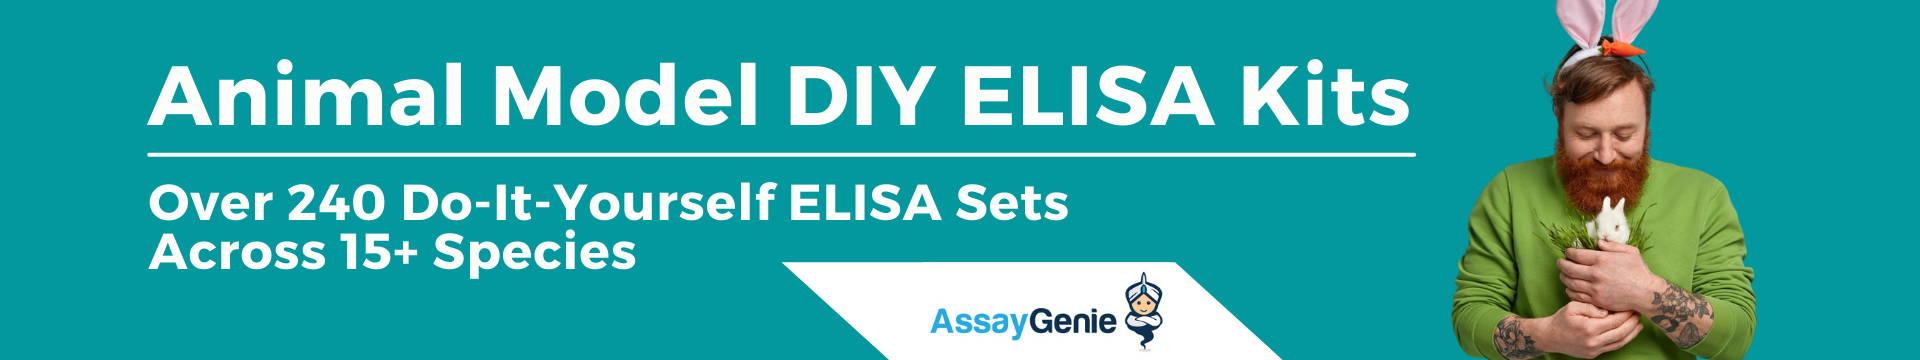 animal model DIY ELISA kits